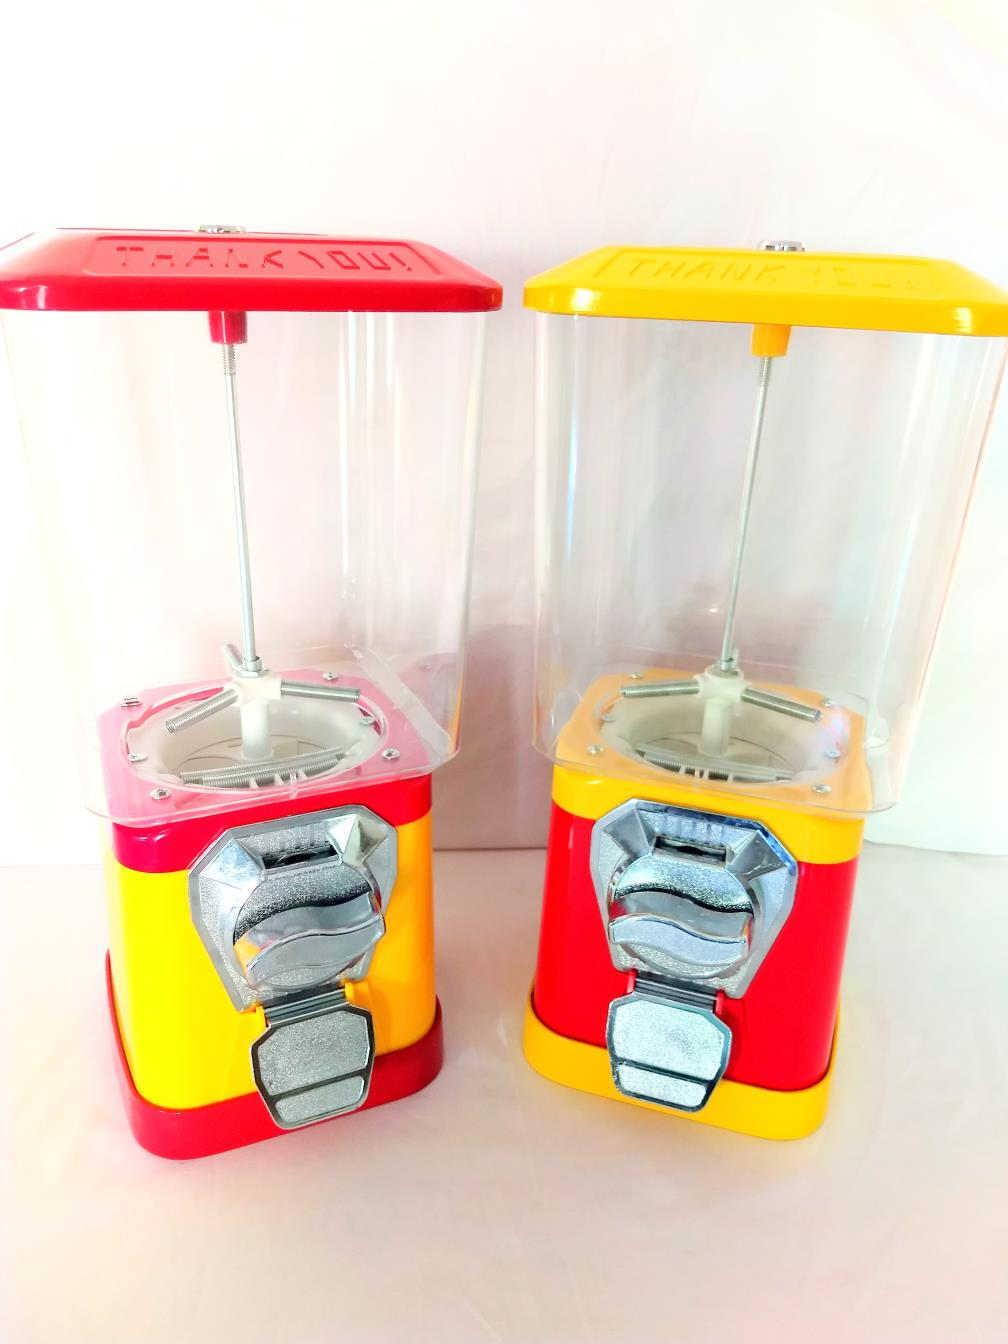 Kit 3 Maquina de Bolinha + Pedestal + Bolinha Pula Pula 27mm + Chicletes + Brinde